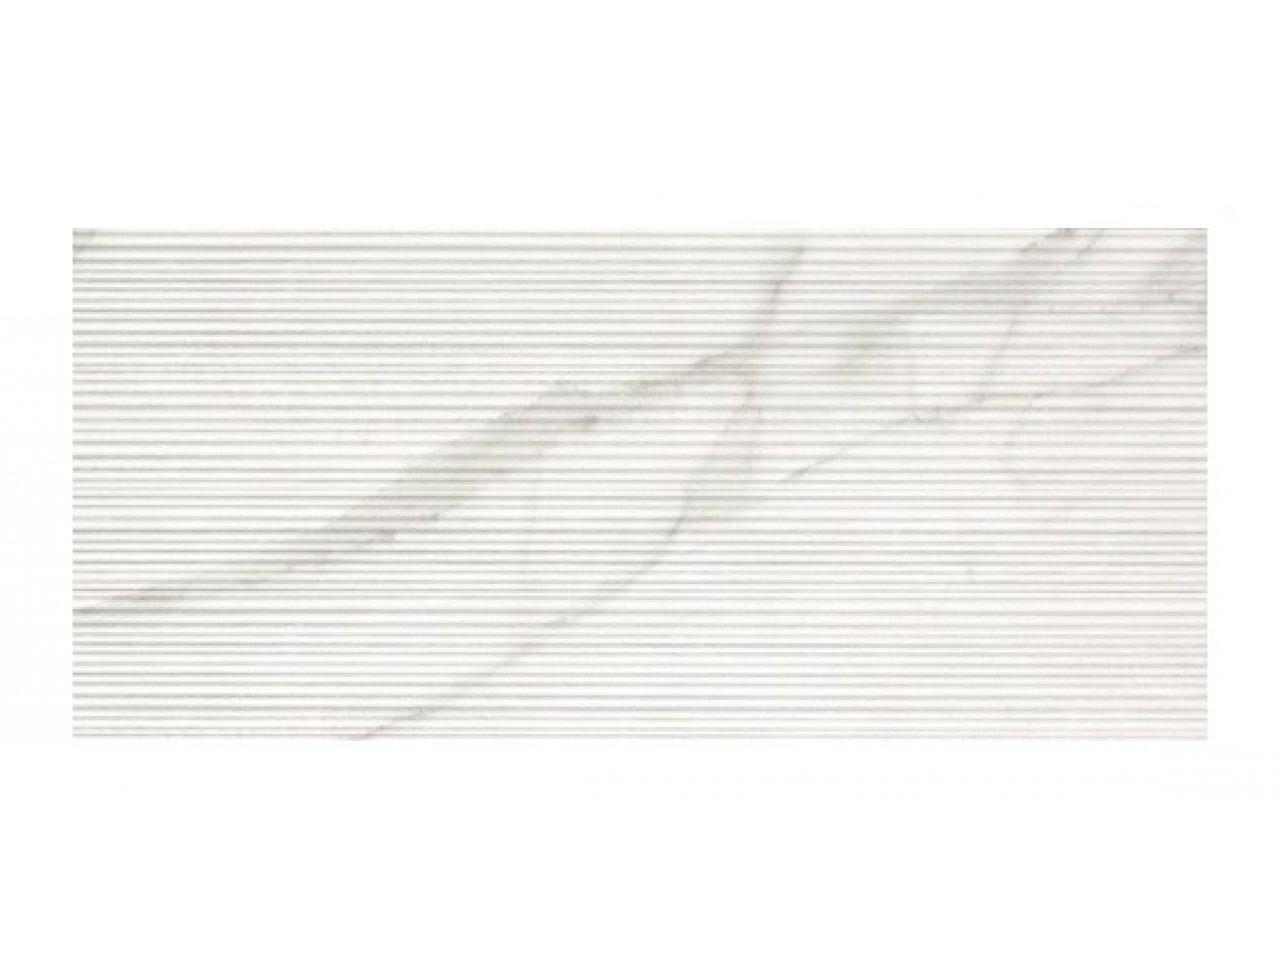 Настенная плитка FAP Roma Diamond 110 Line Statuario Brillante RT 110 x 50 см, Арт. fNHM